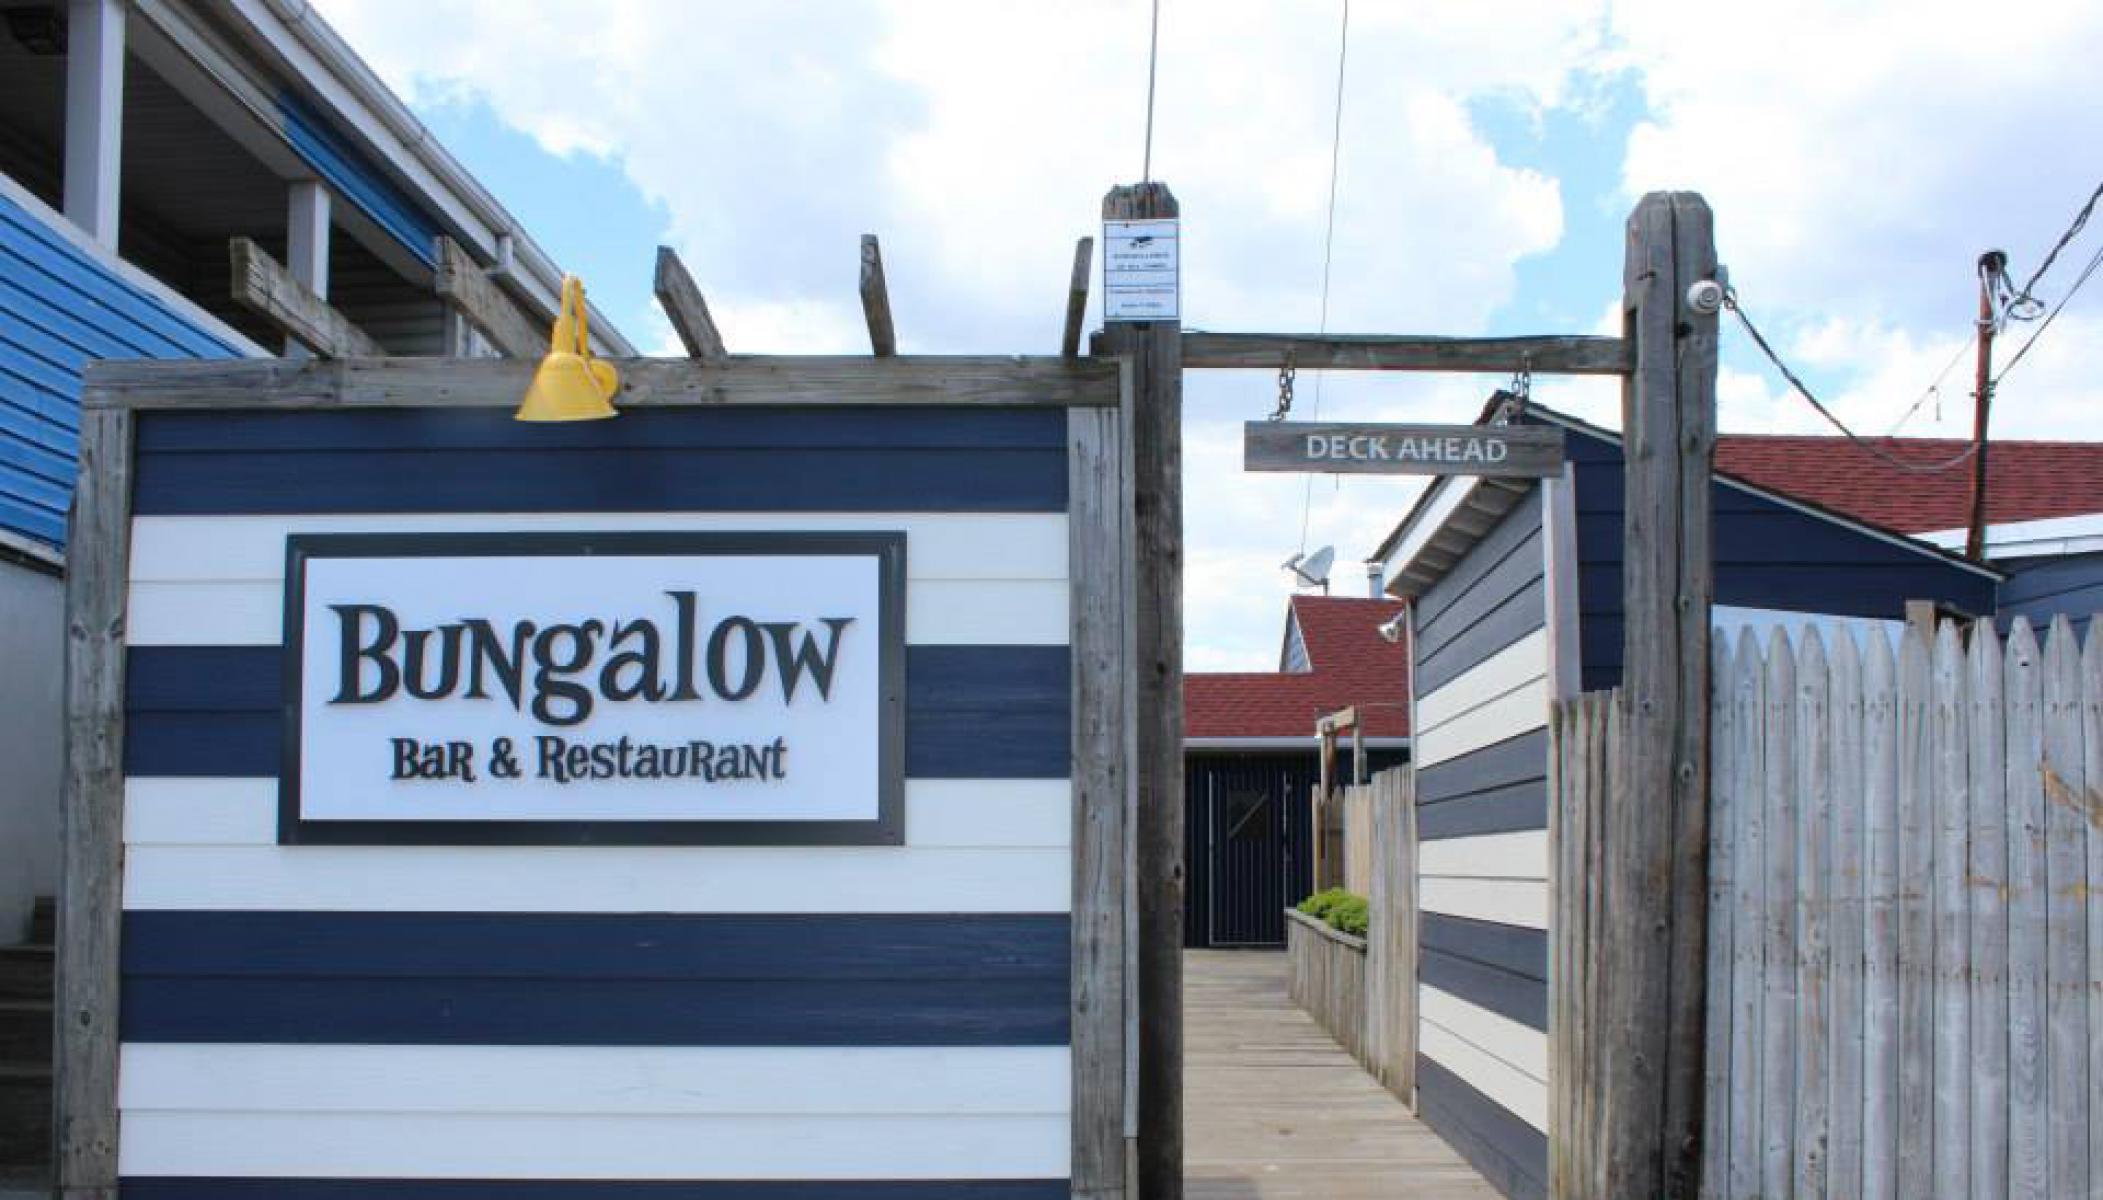 Bungalow Bar & Restaurant